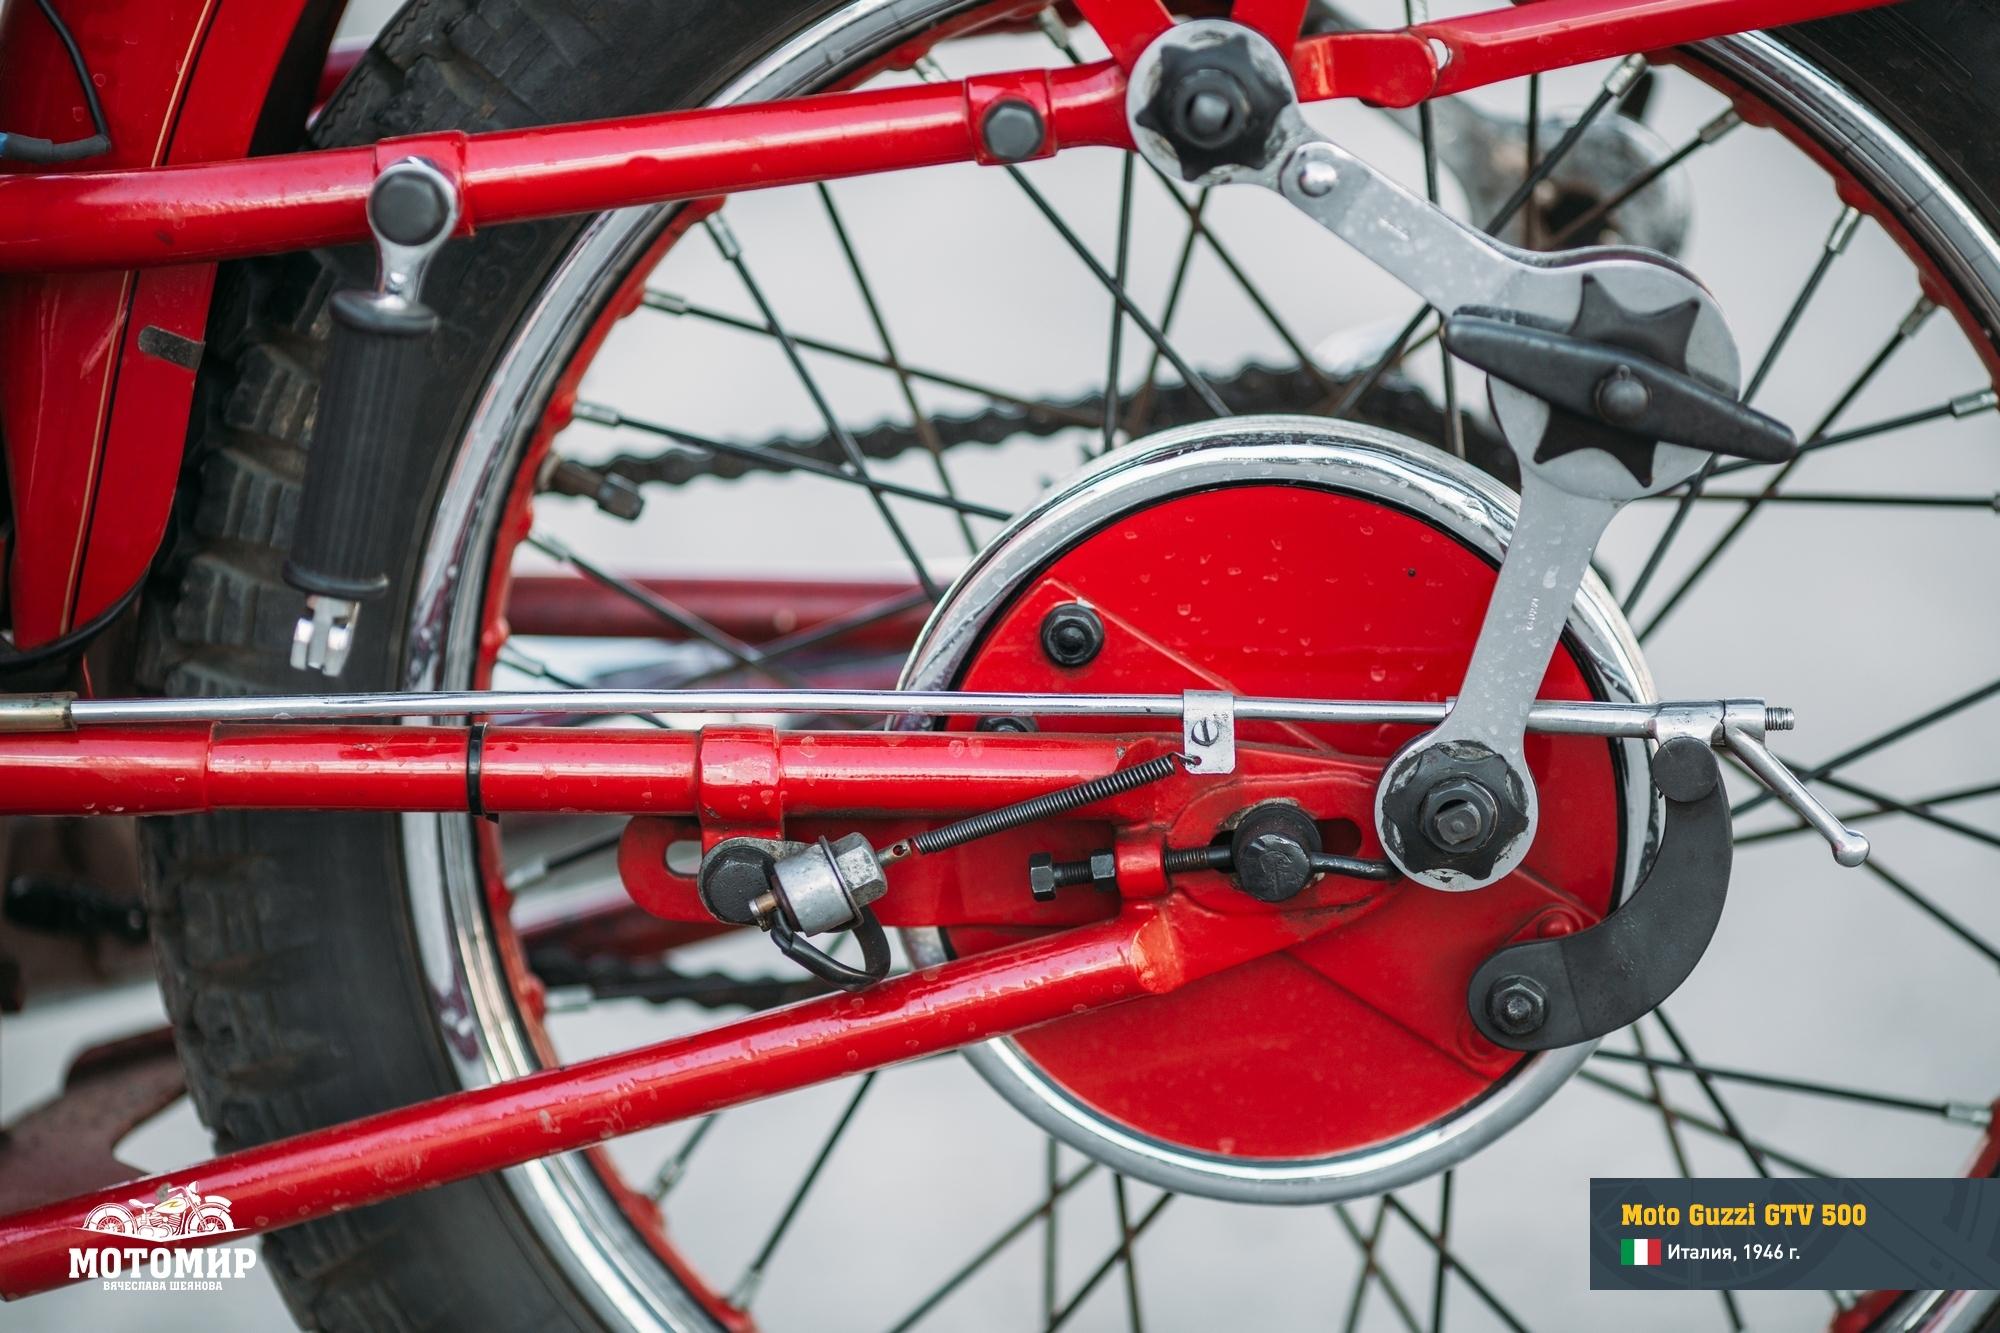 moto-guzzi-gtv-500-201509-web-18